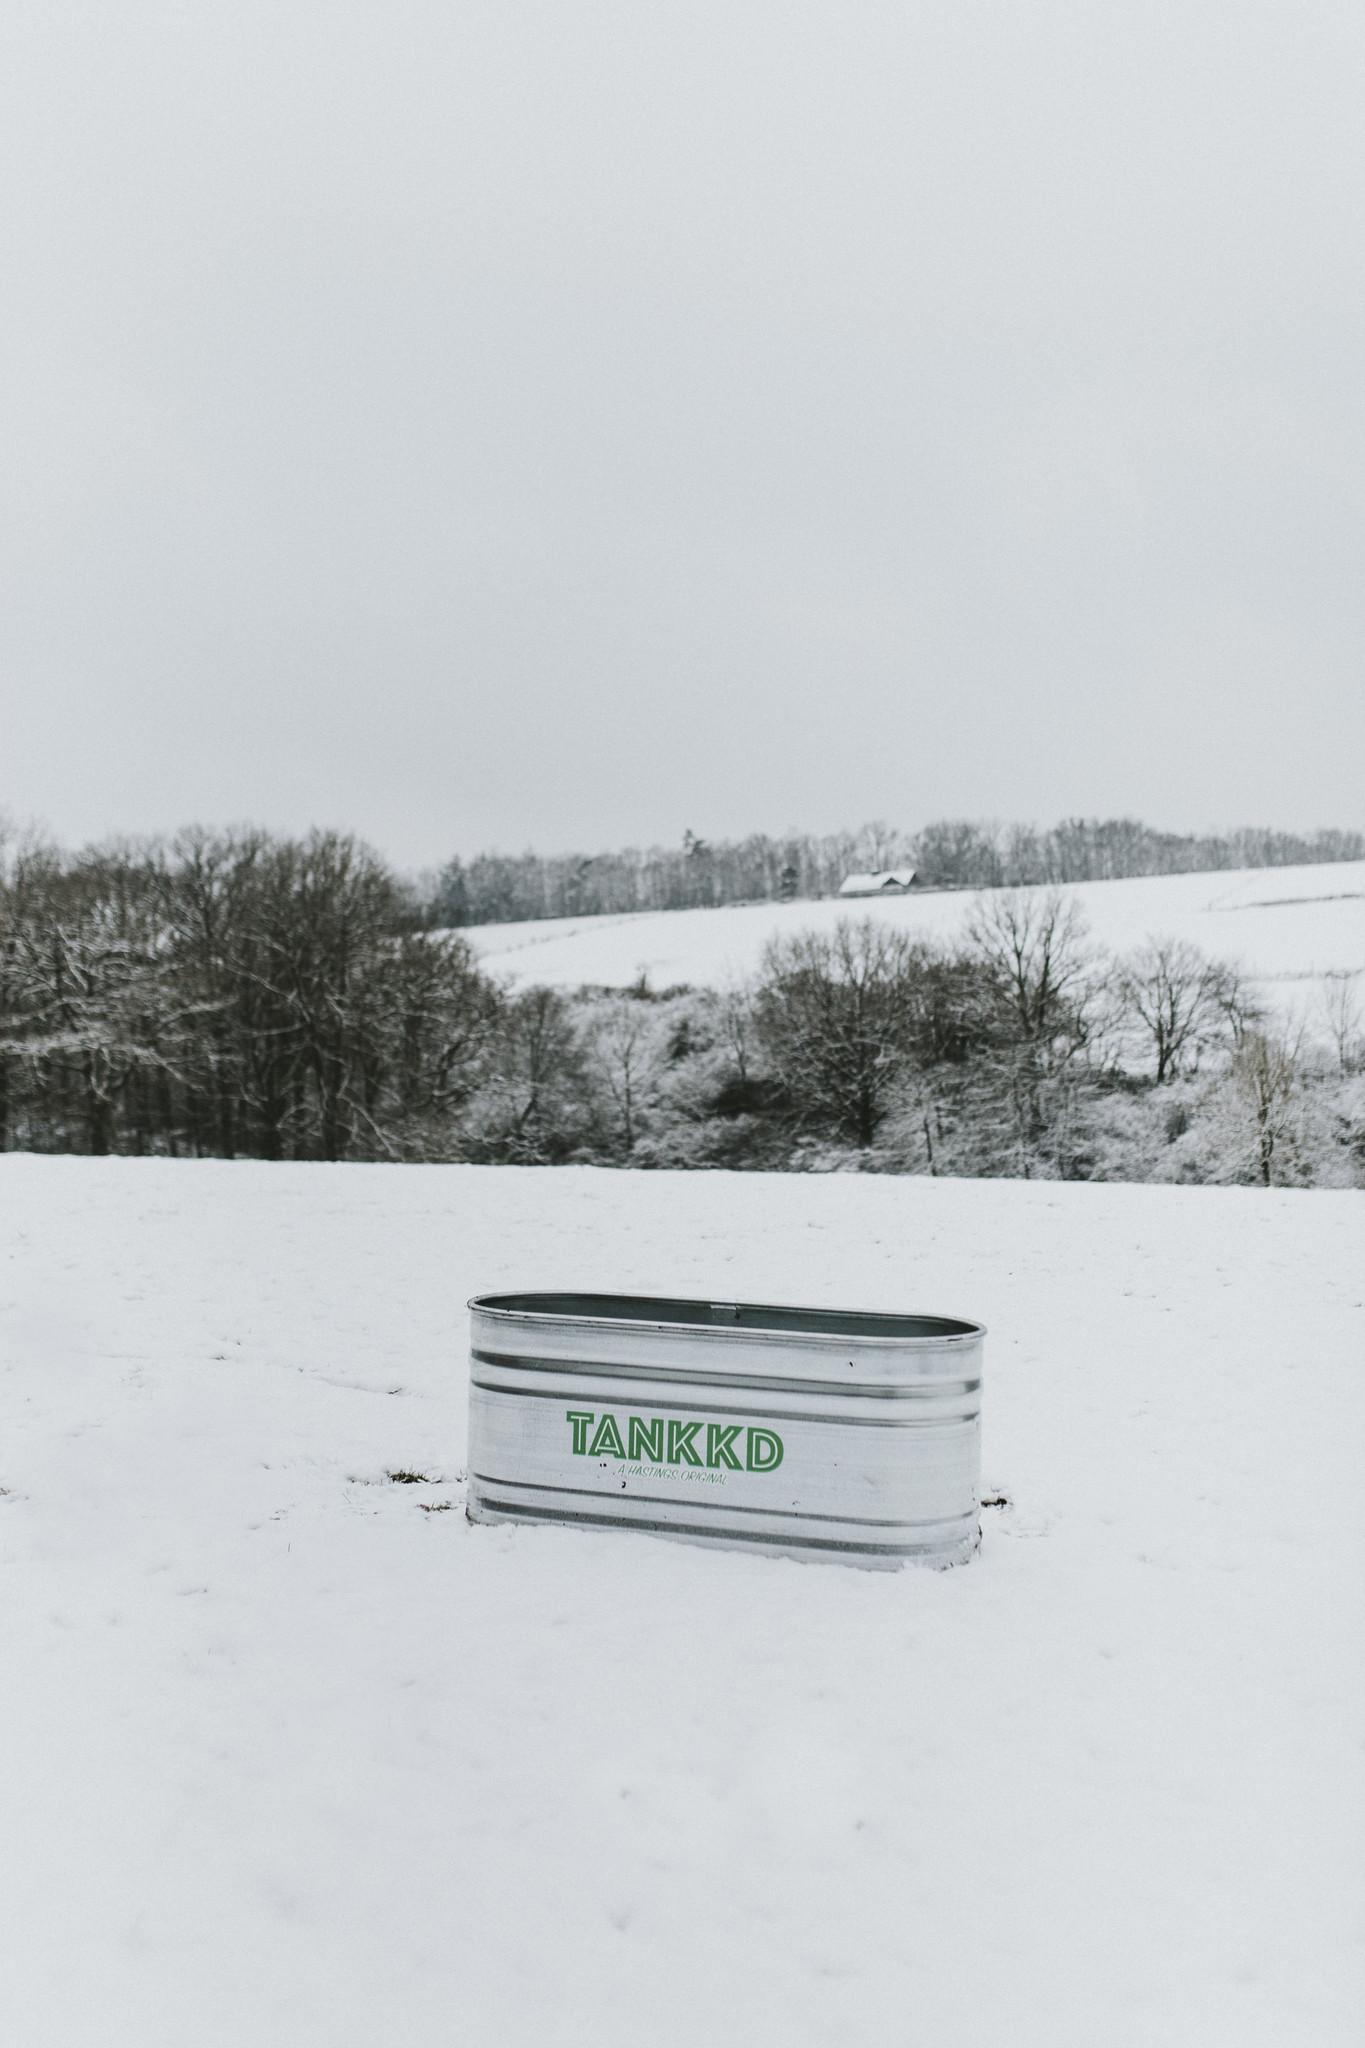 Tankkd Eskimo pack basic-5